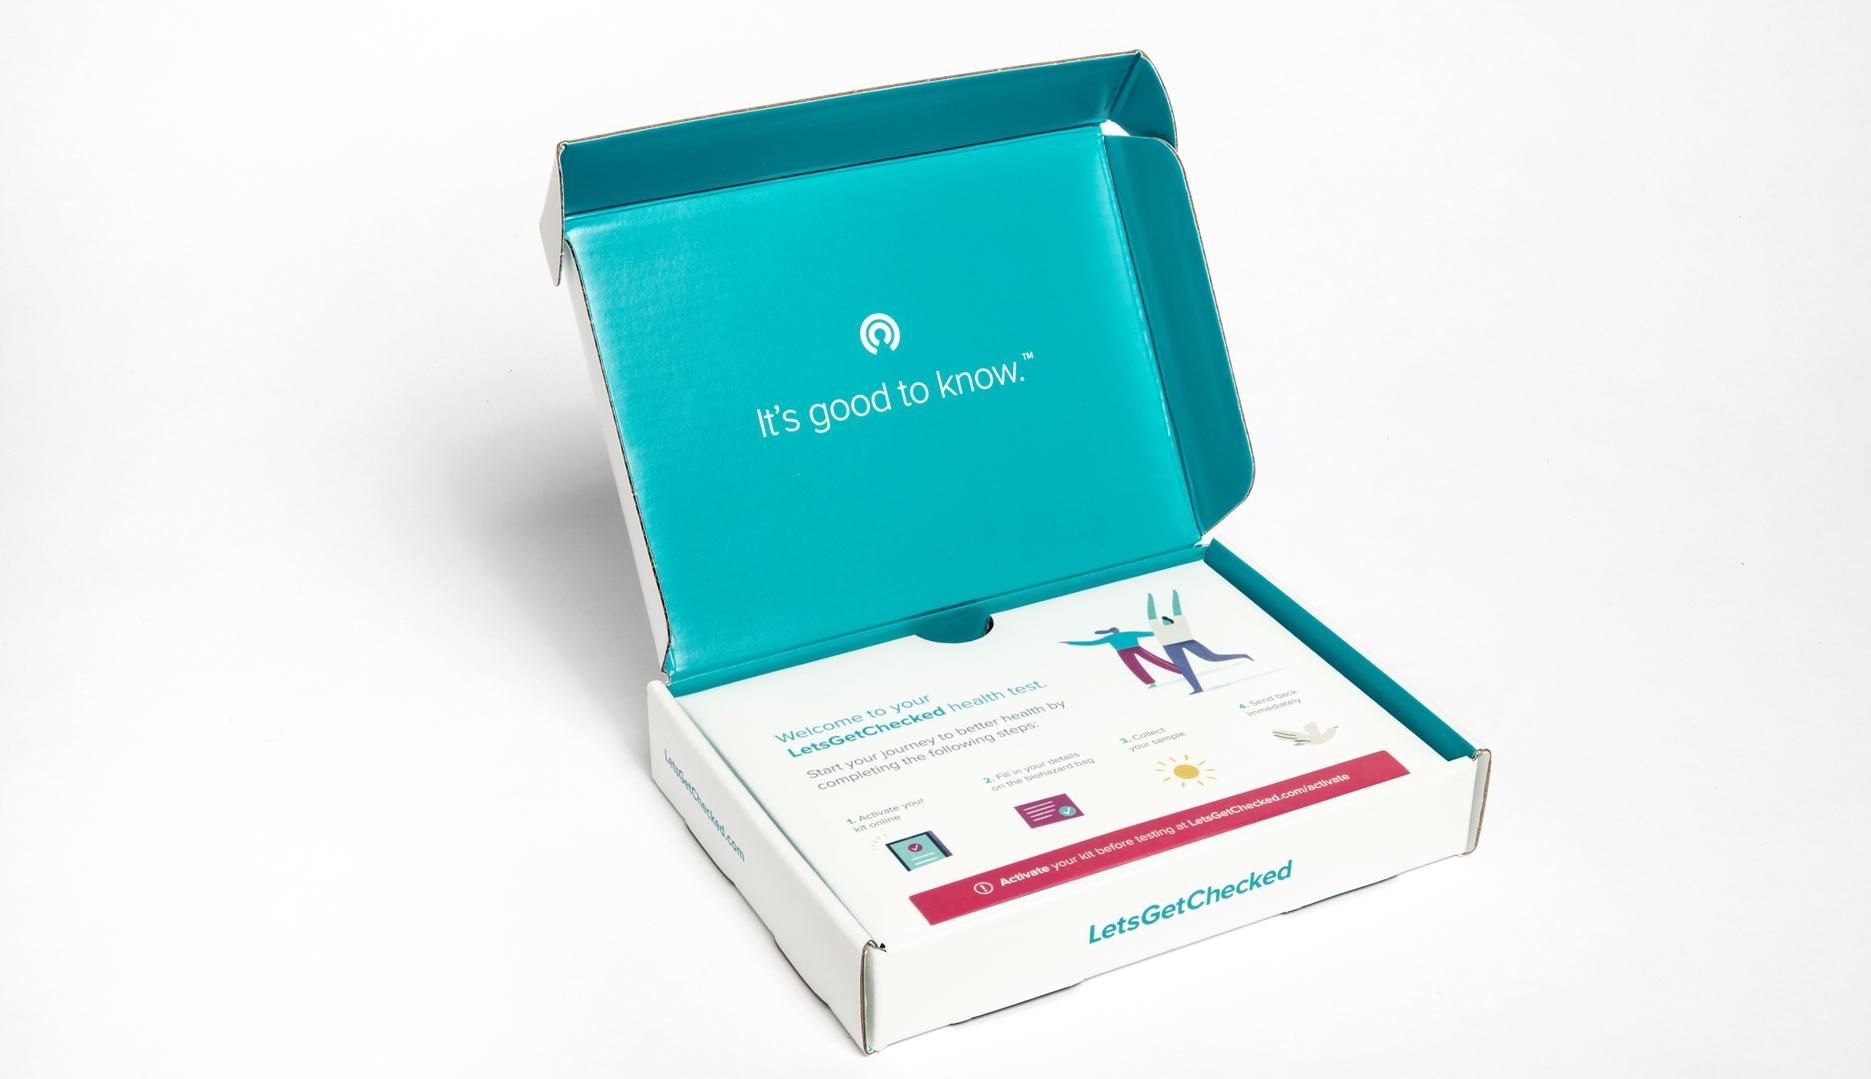 LetsGetChecked raises $71 million for at-home coronavirus test kits 3